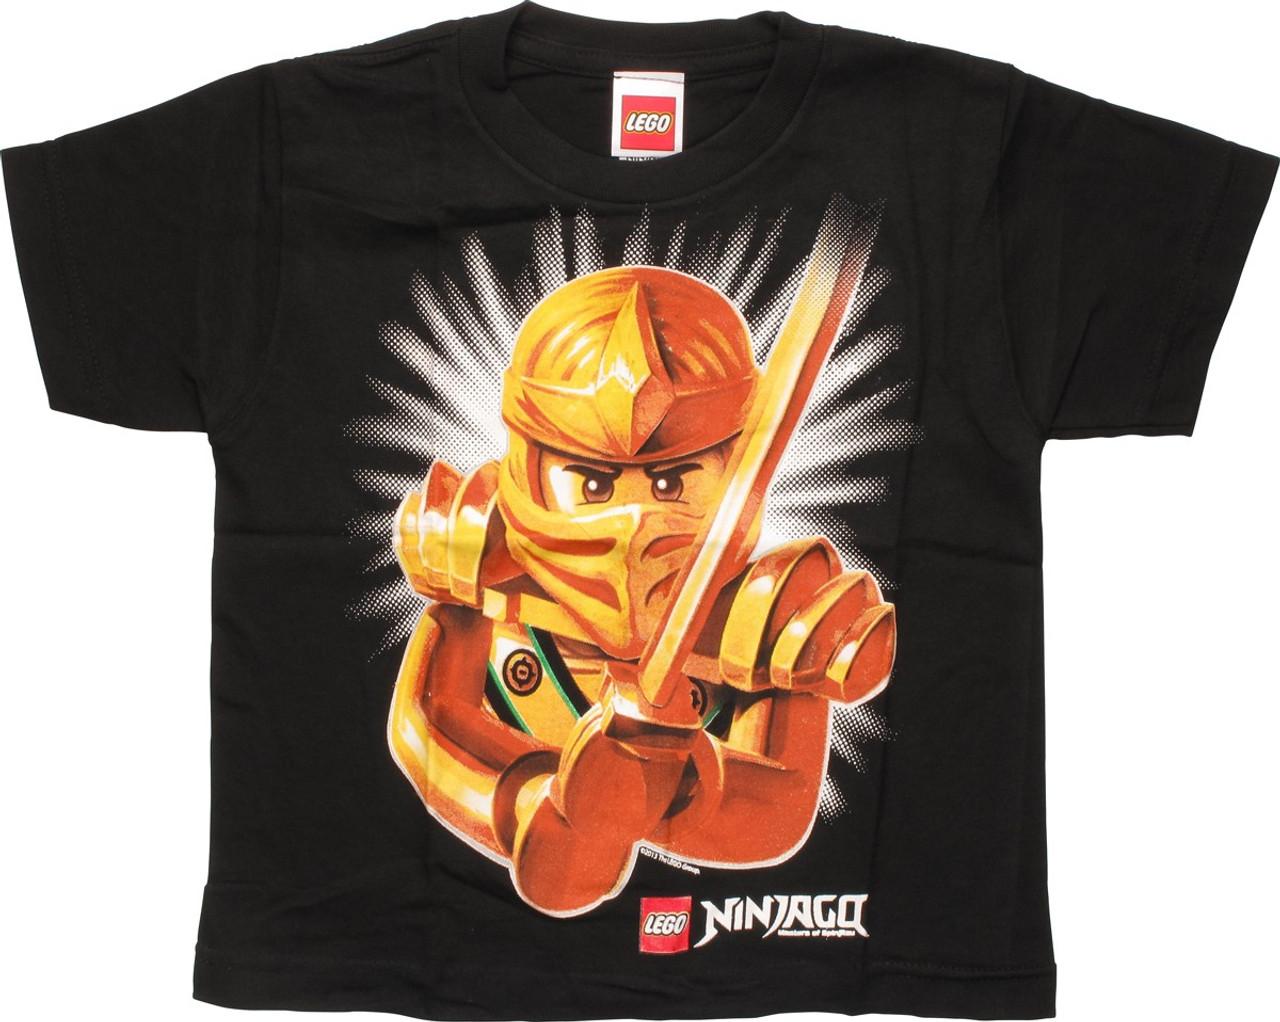 Job For Ninja! Red//Green Boys Lot of 2 Lego Ninjago Shirts Size 4 5-6 New 7